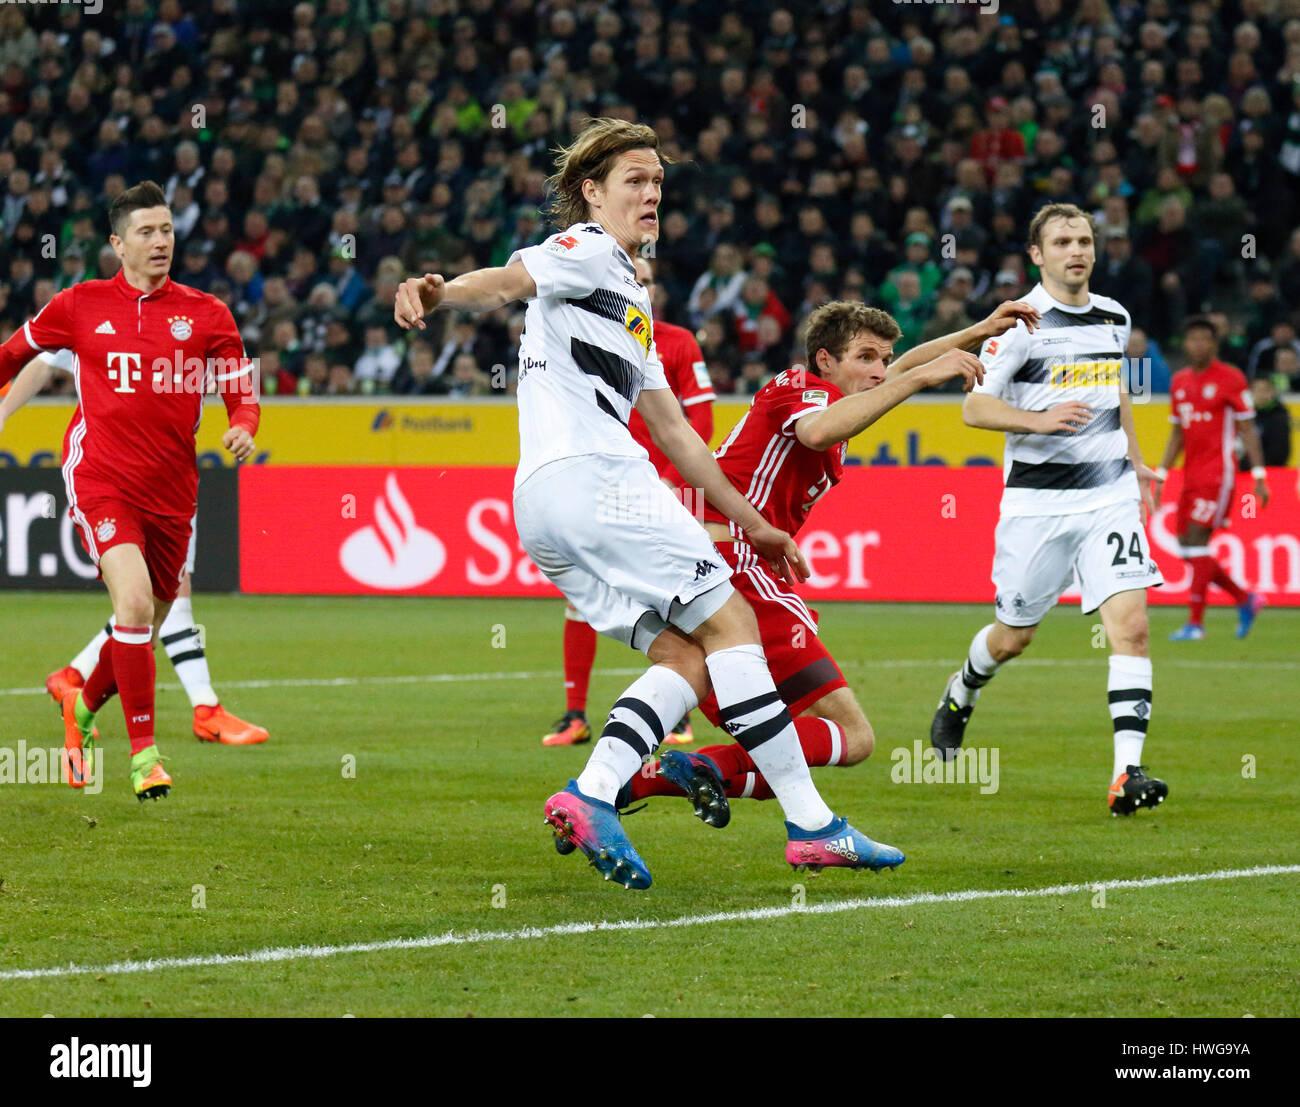 Fc Bayern München Gegen Borussia Mönchengladbach